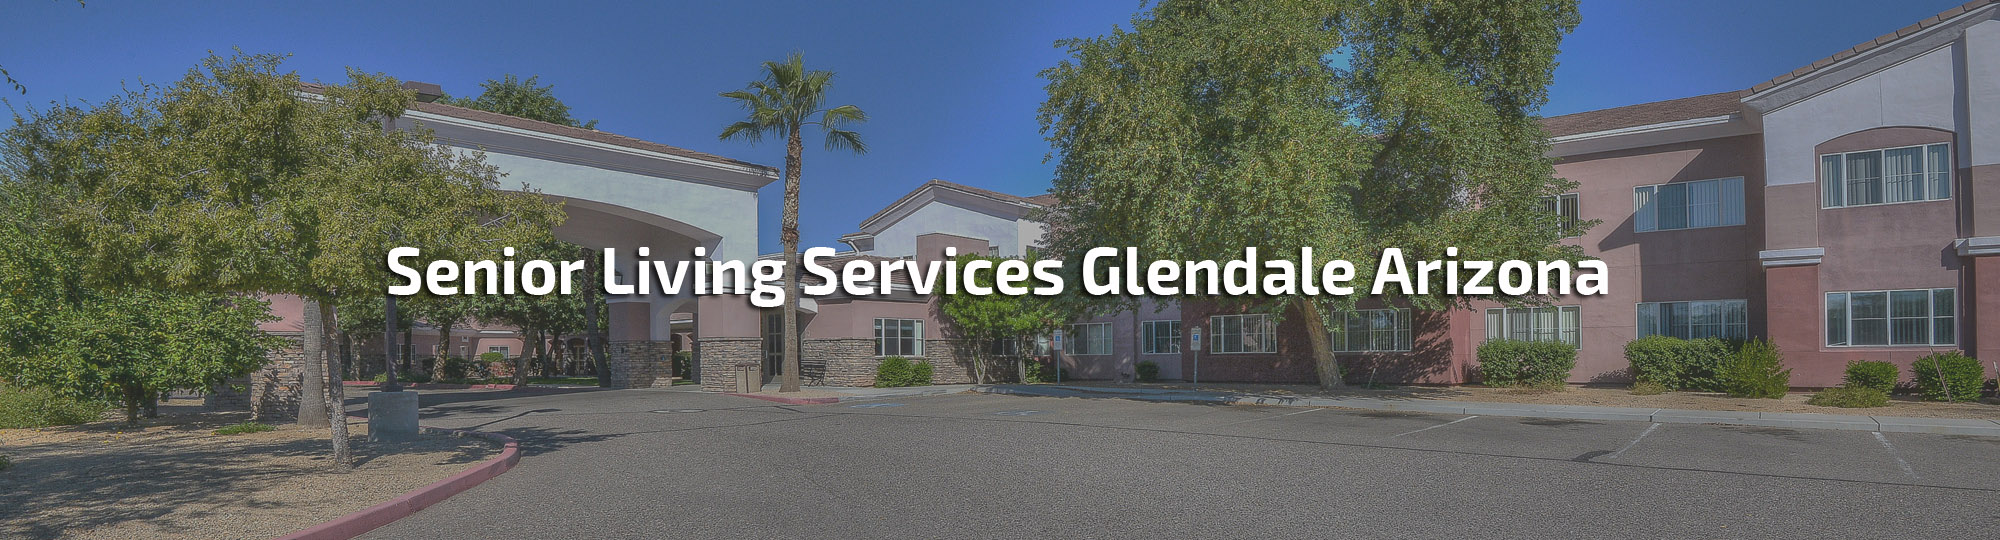 Senior Living Services Glendale Arizona